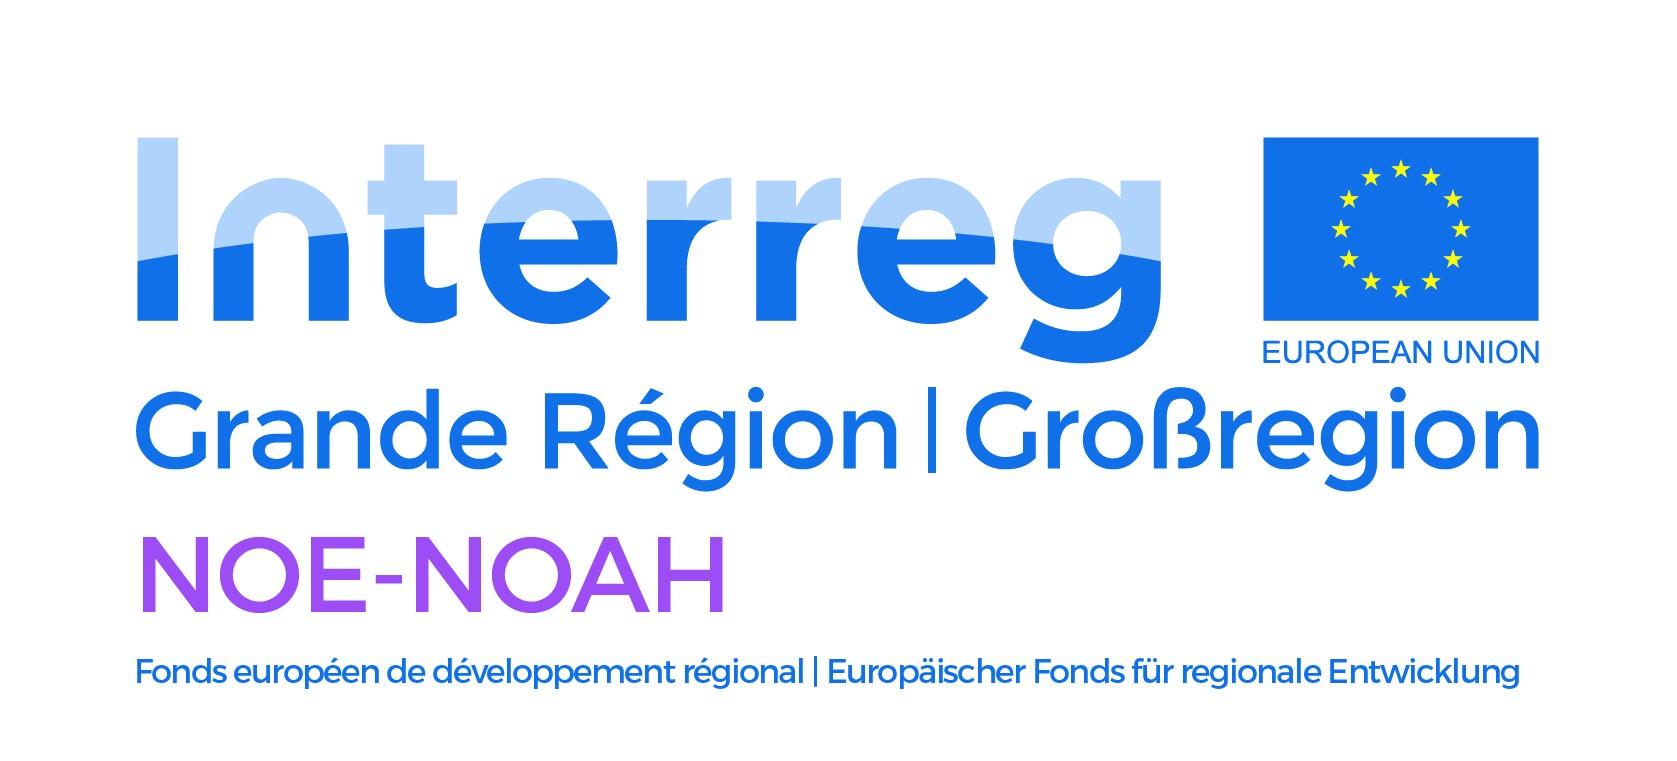 image Interreg_Noe.jpg (0.2MB) Lien vers: https://www.noenoah.eu/